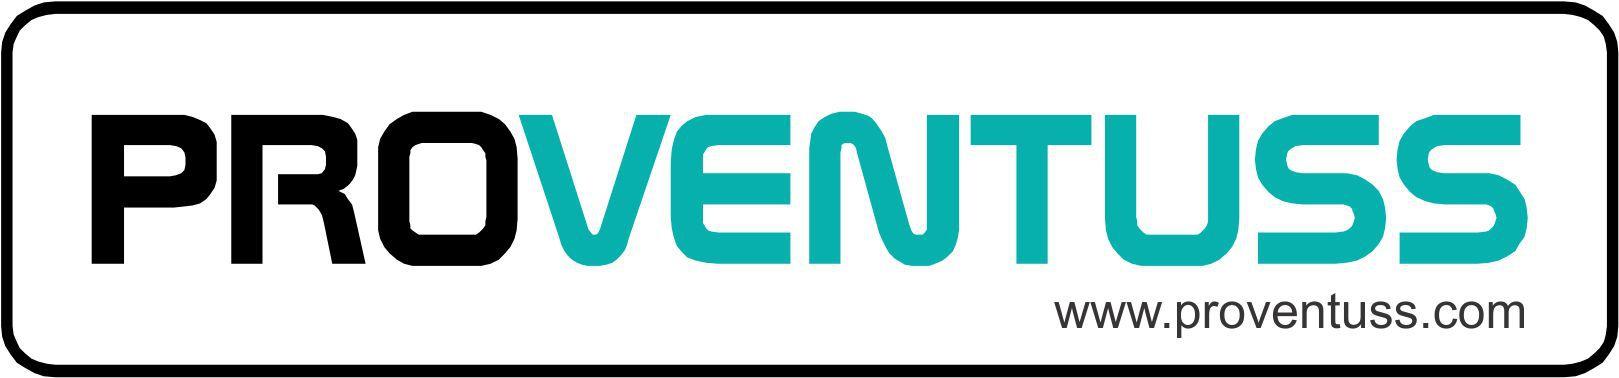 PROVENTUSS www.proventuss.com